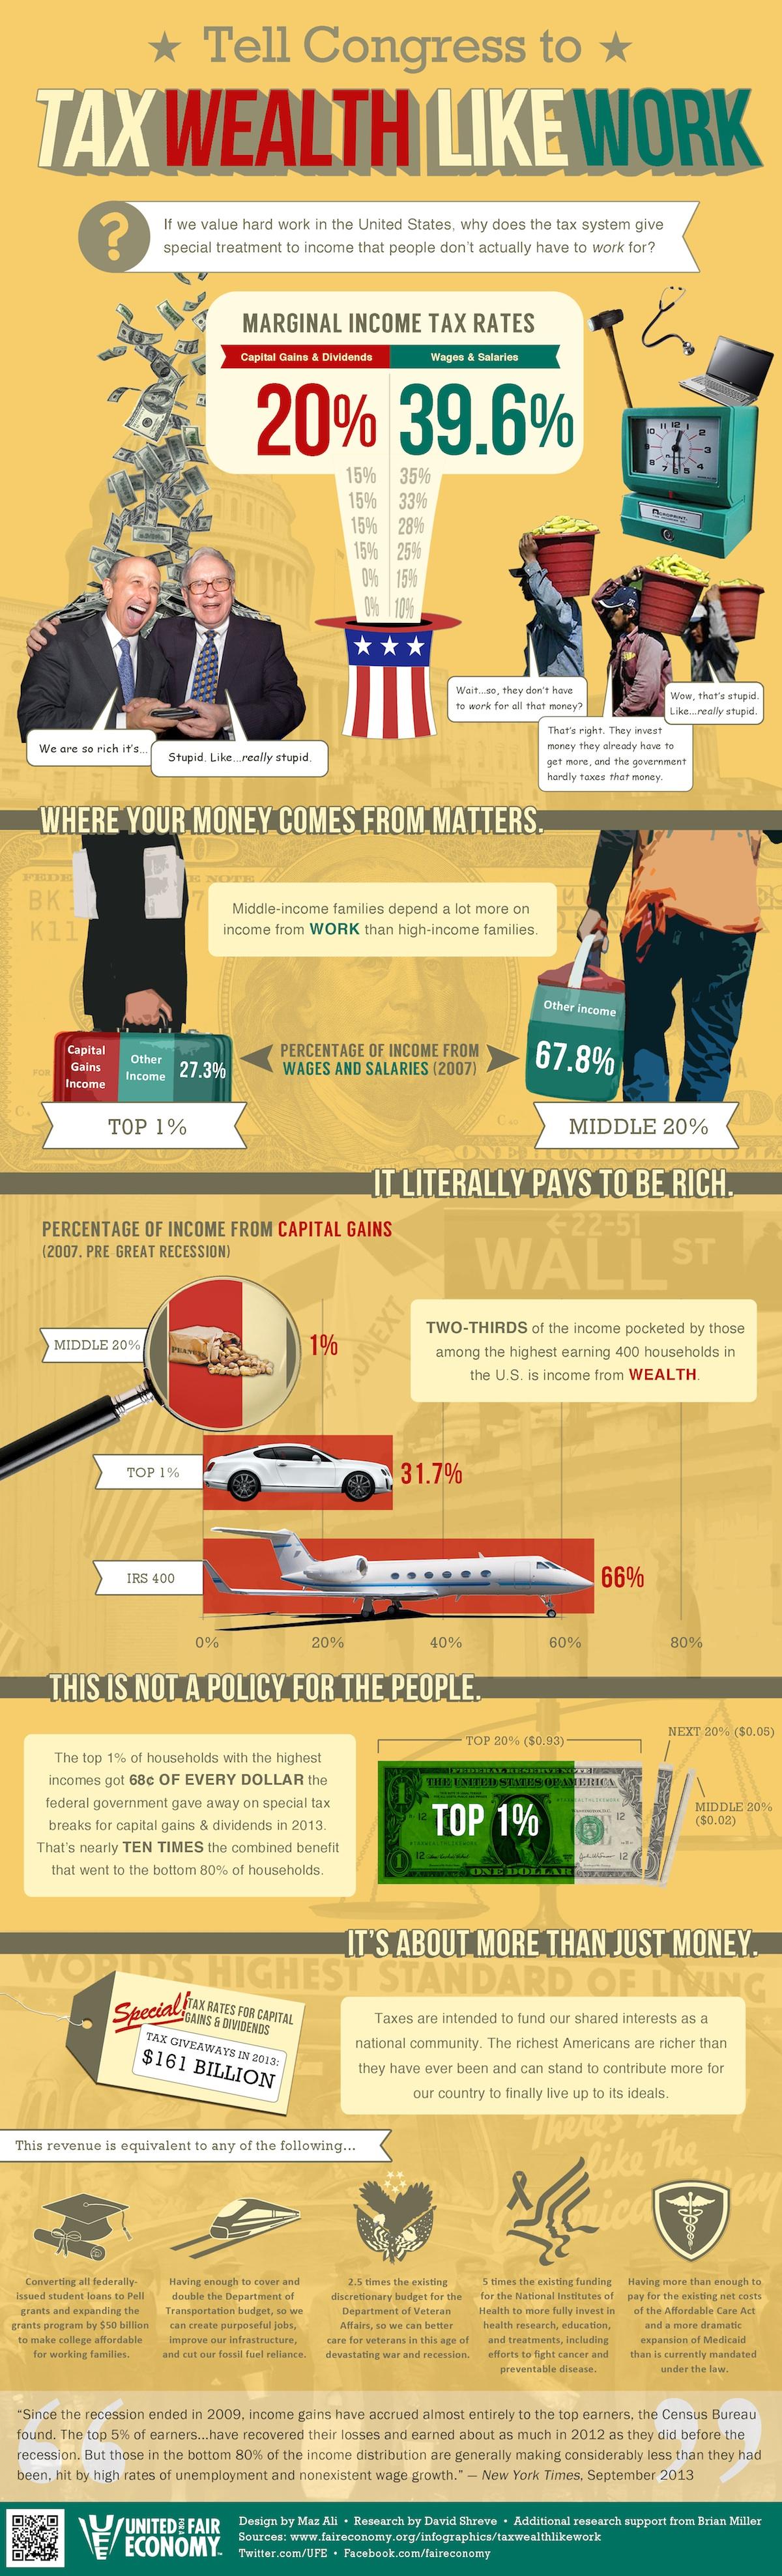 Tax Wealth.jpg